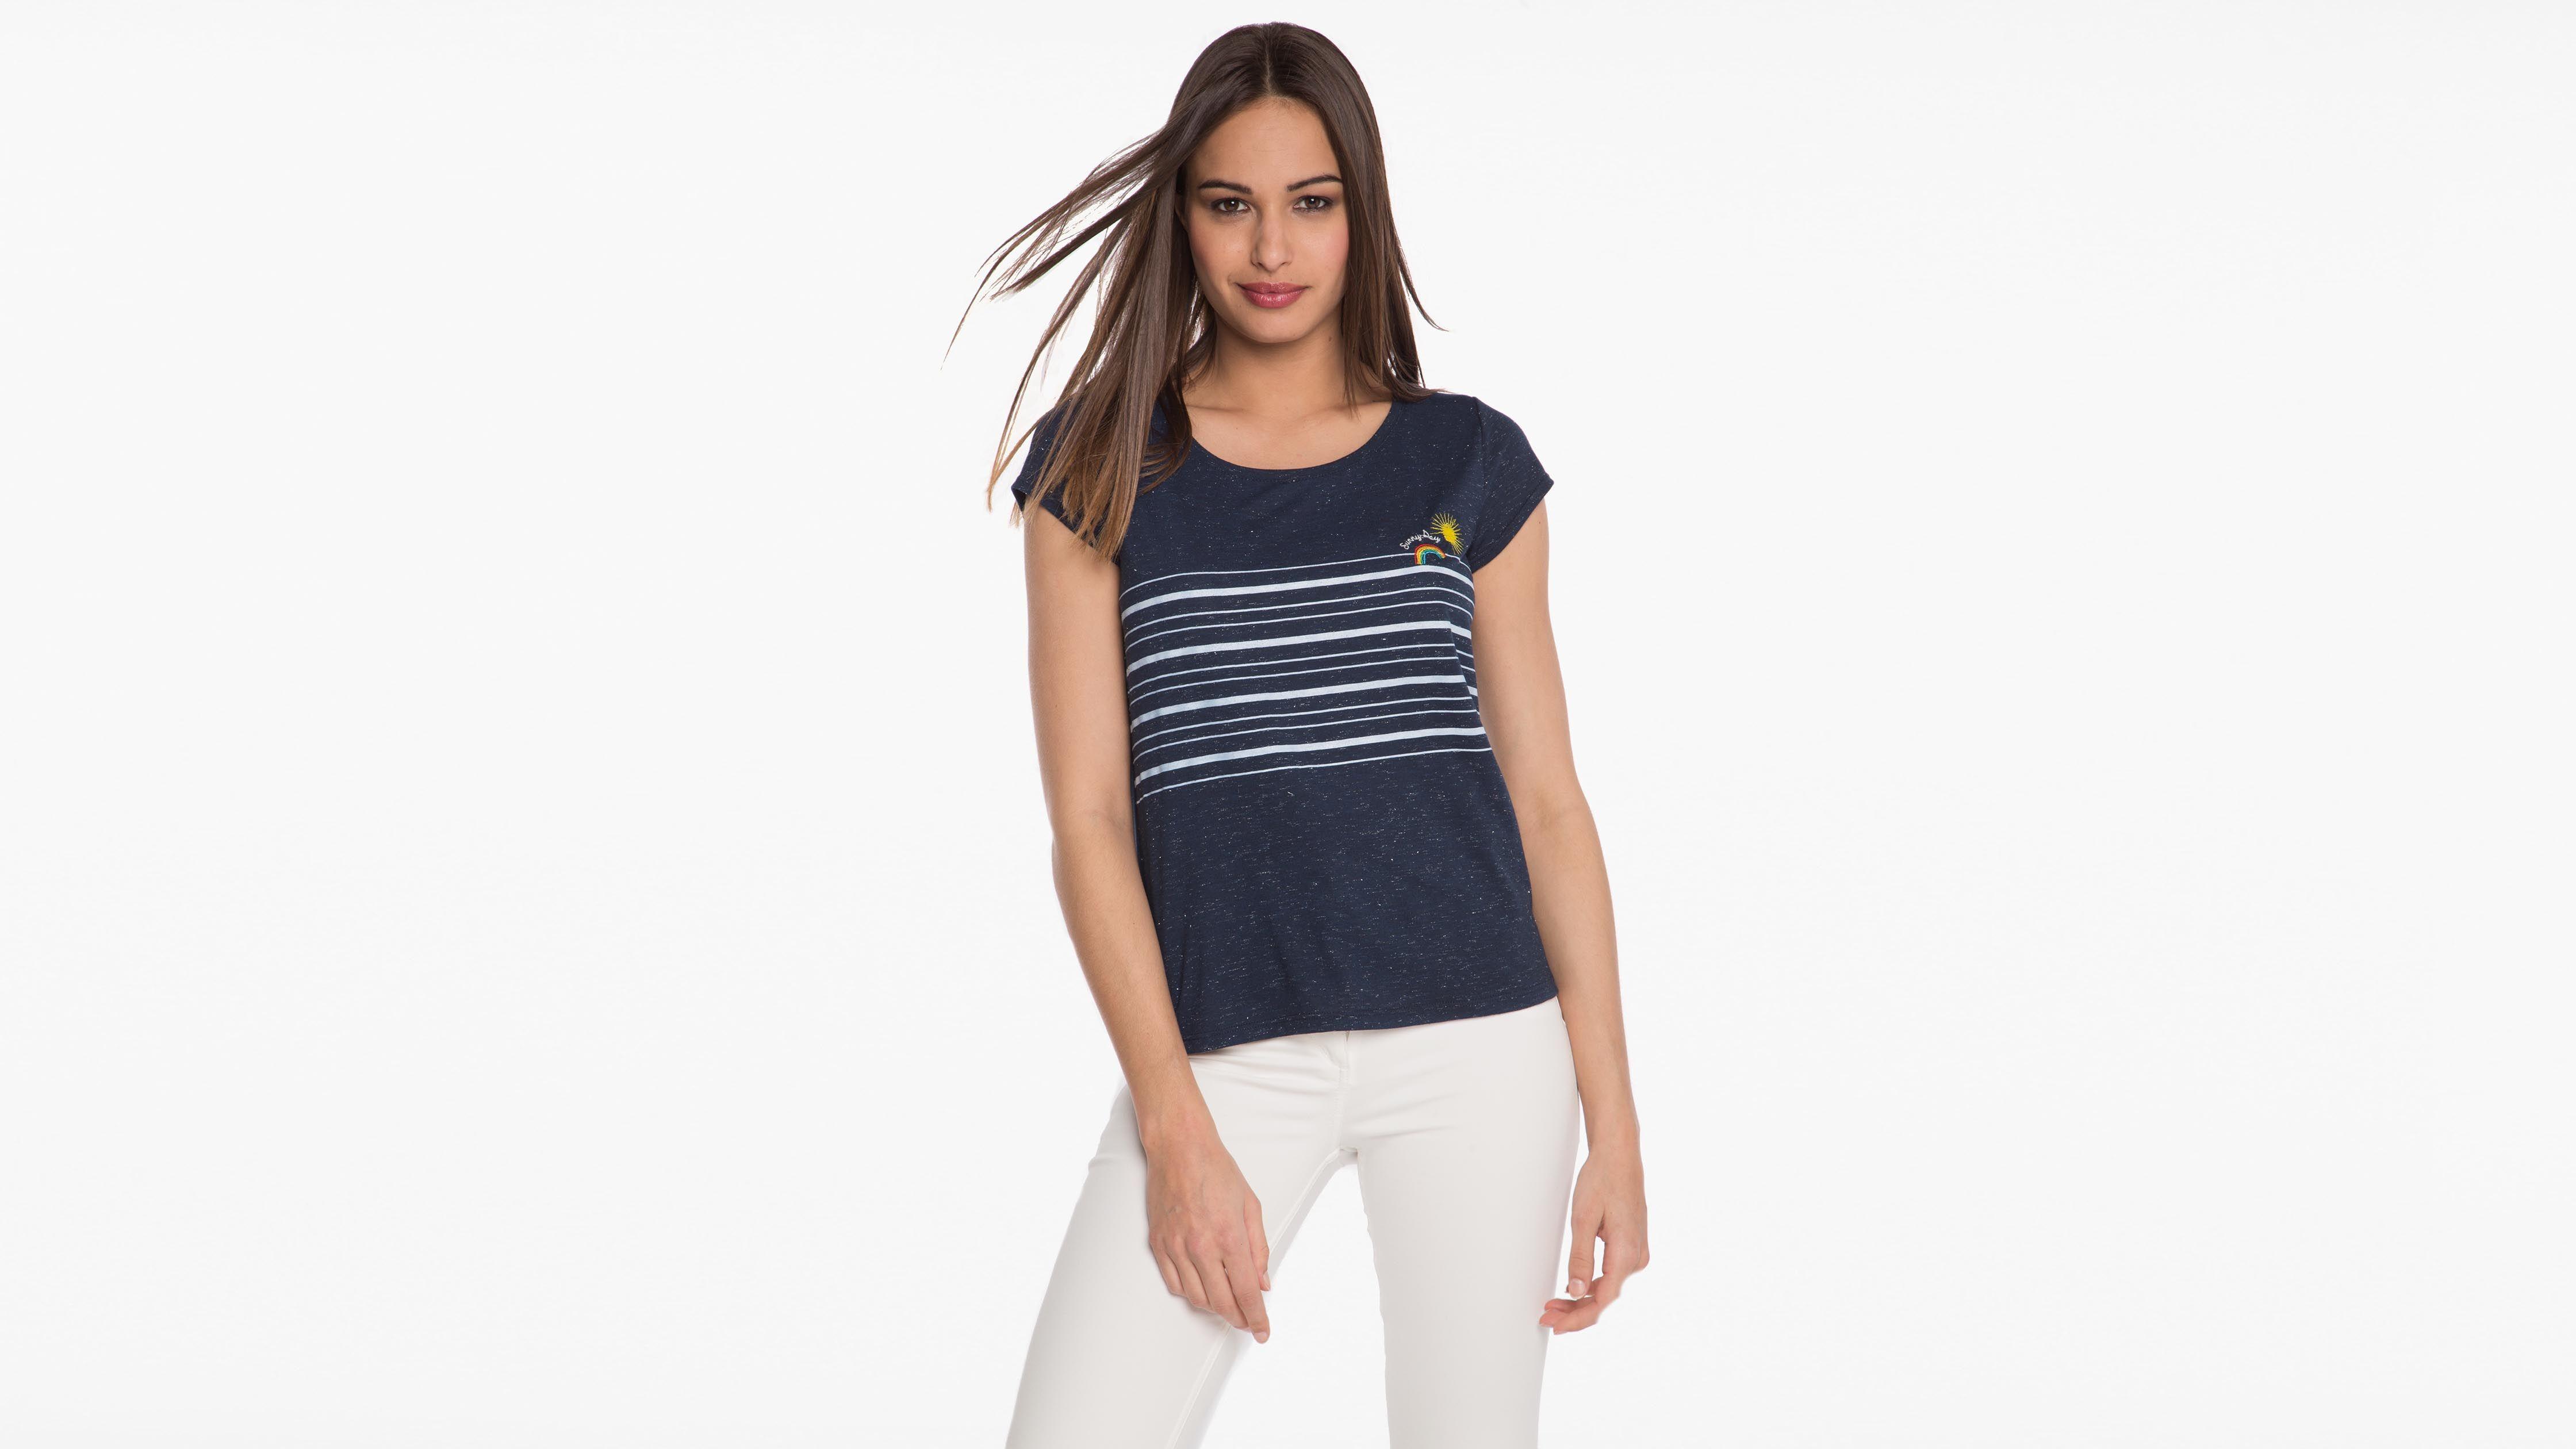 Shirt Femme T T Shirt T Femme Shirt Femme Imprime Imprime Bleu Bleu BCexord